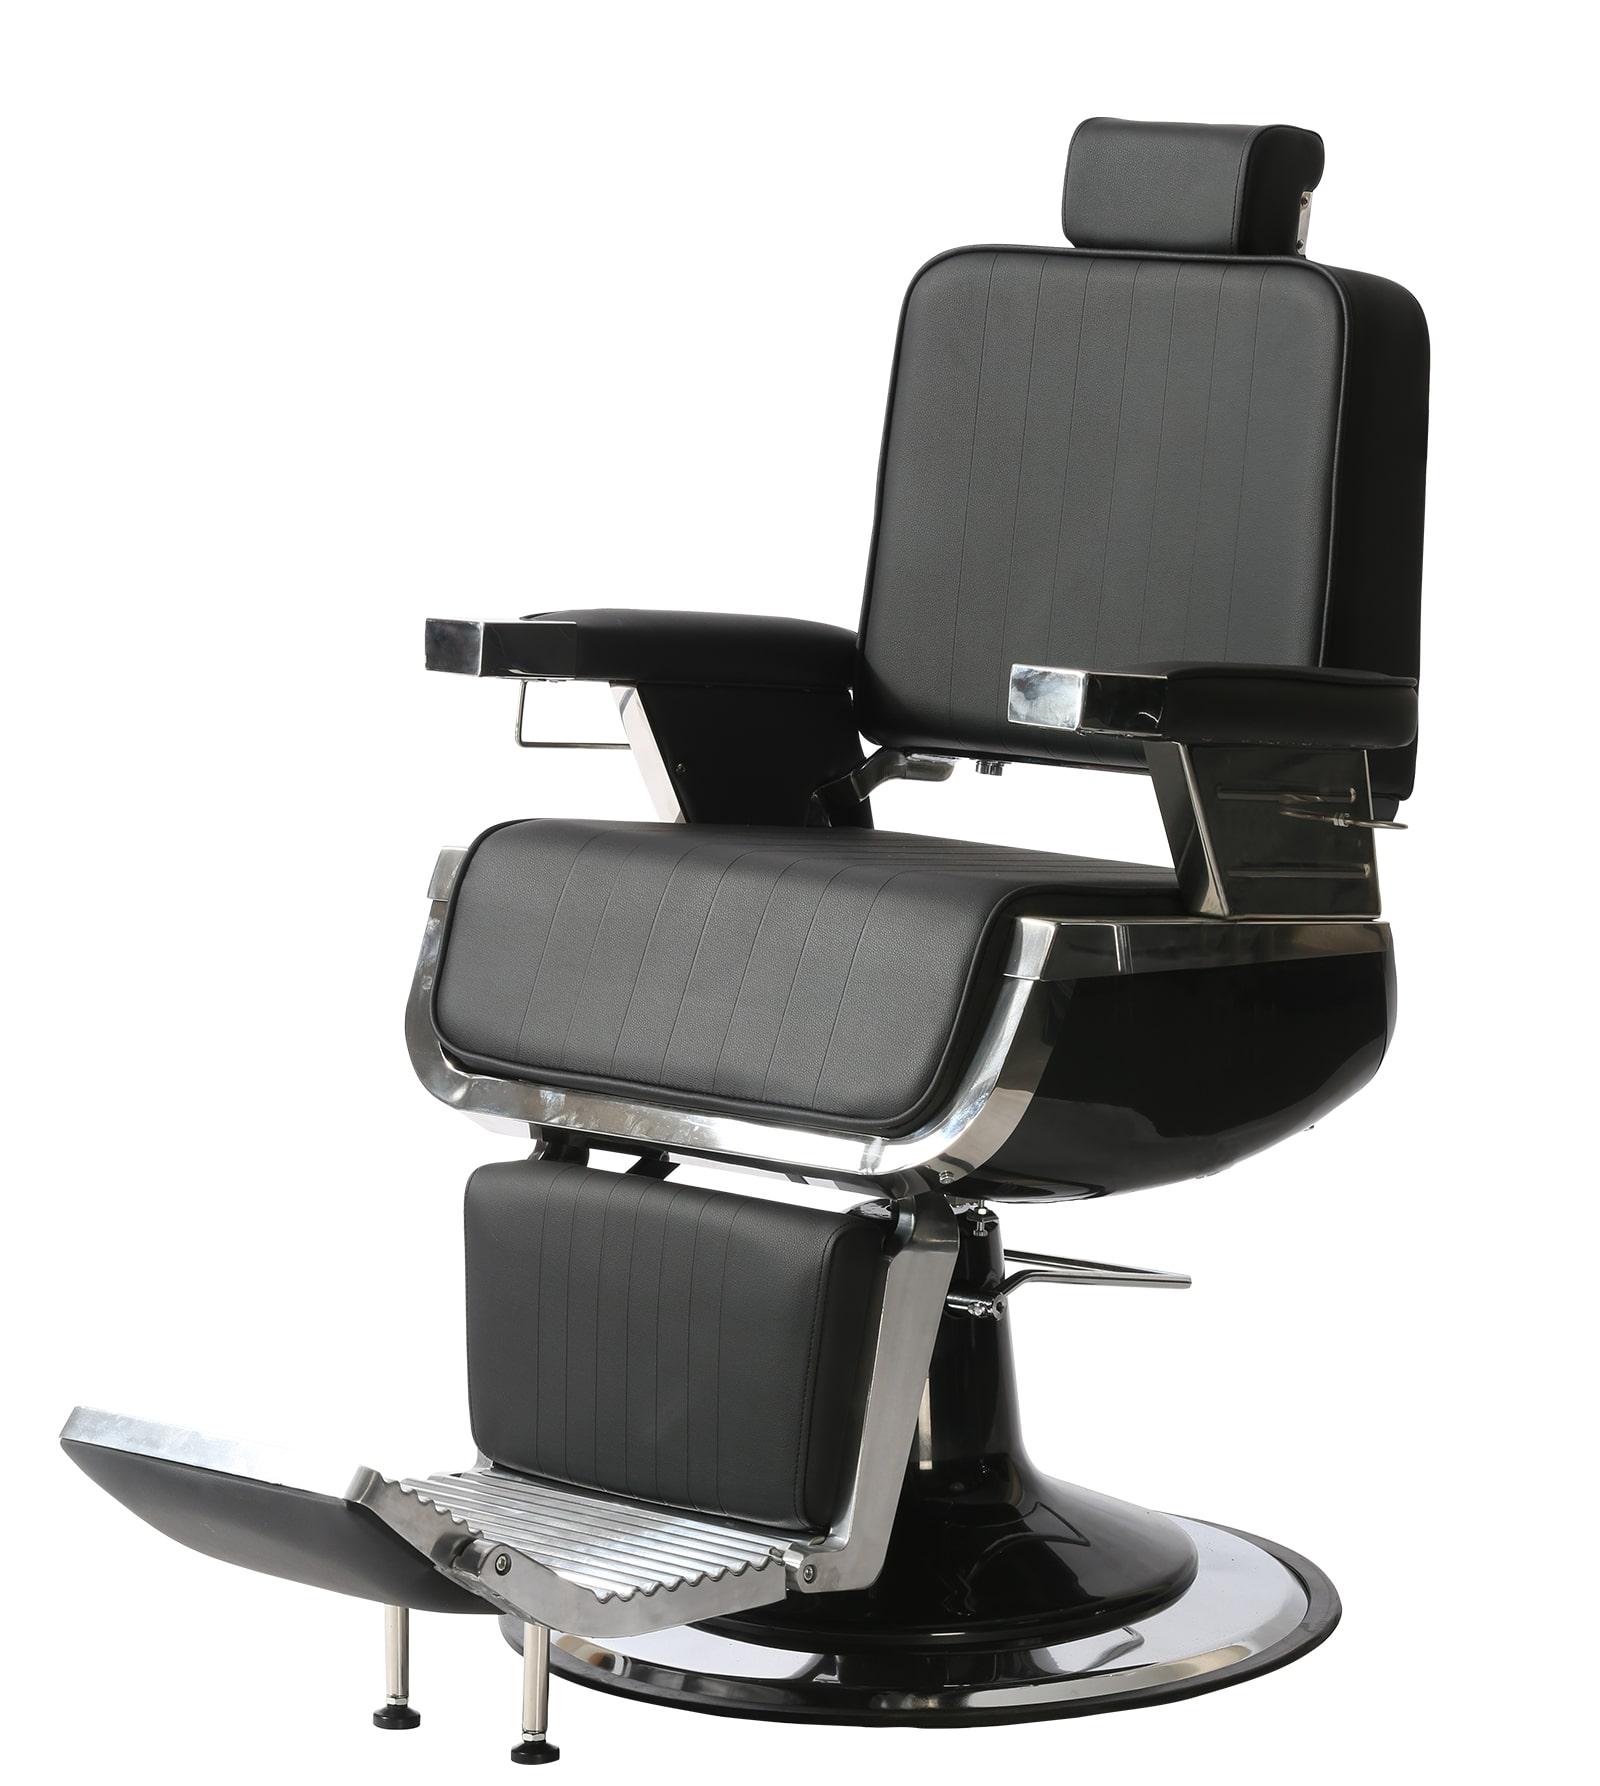 Super Salon - barber kreslo Dark + Ragnar Supernova - strihací strojček a  Ragnar Cosmic - kontúrovací strojček